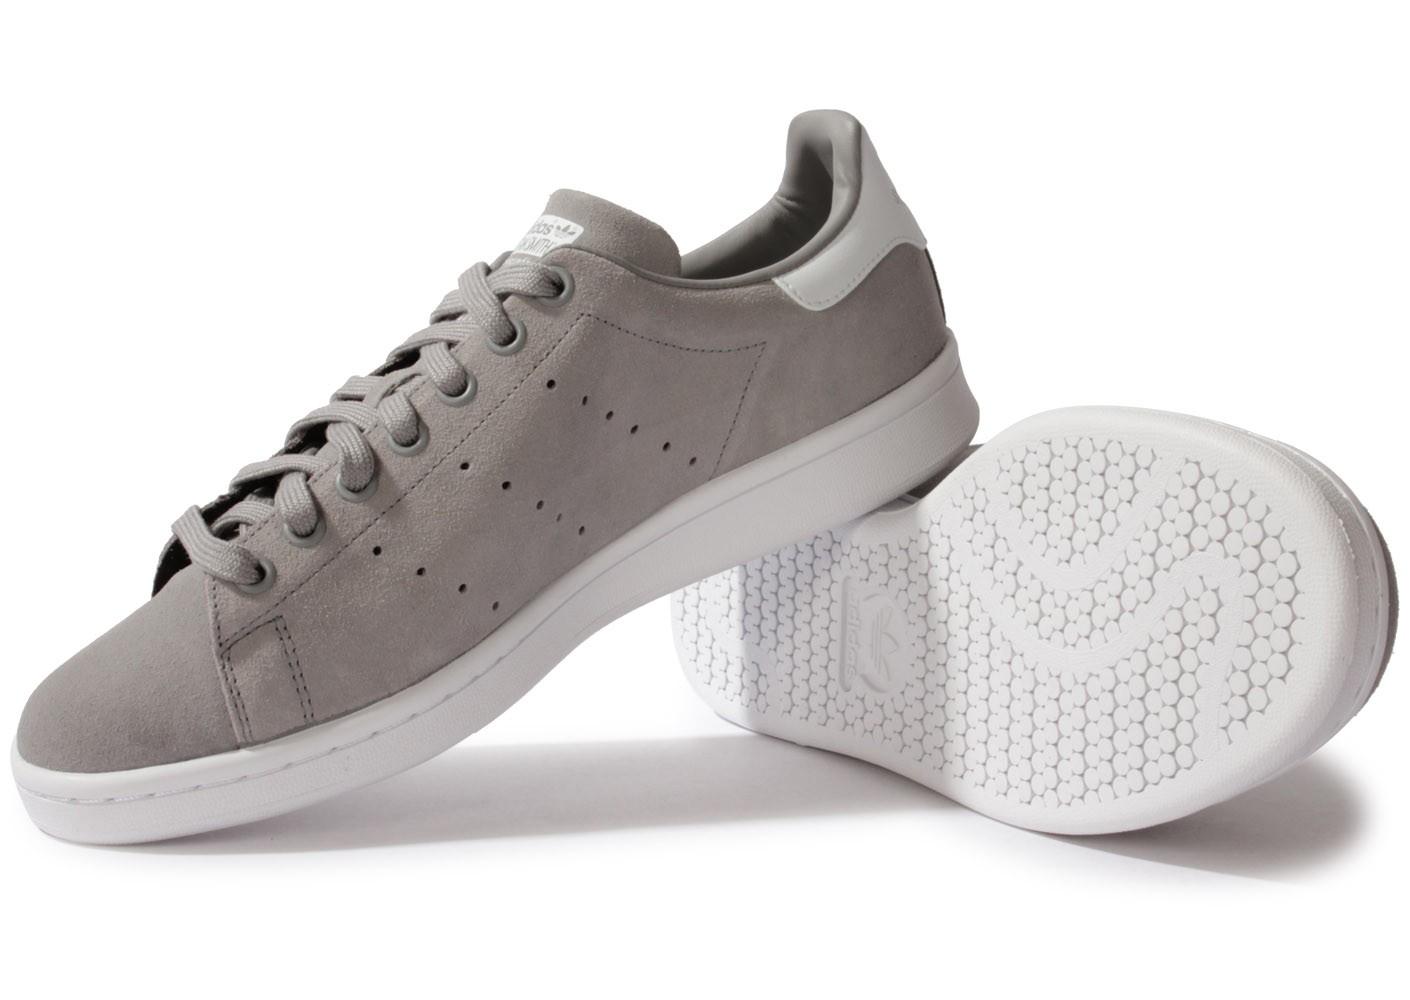 Adidas Stan Smith Femme Cdiscount